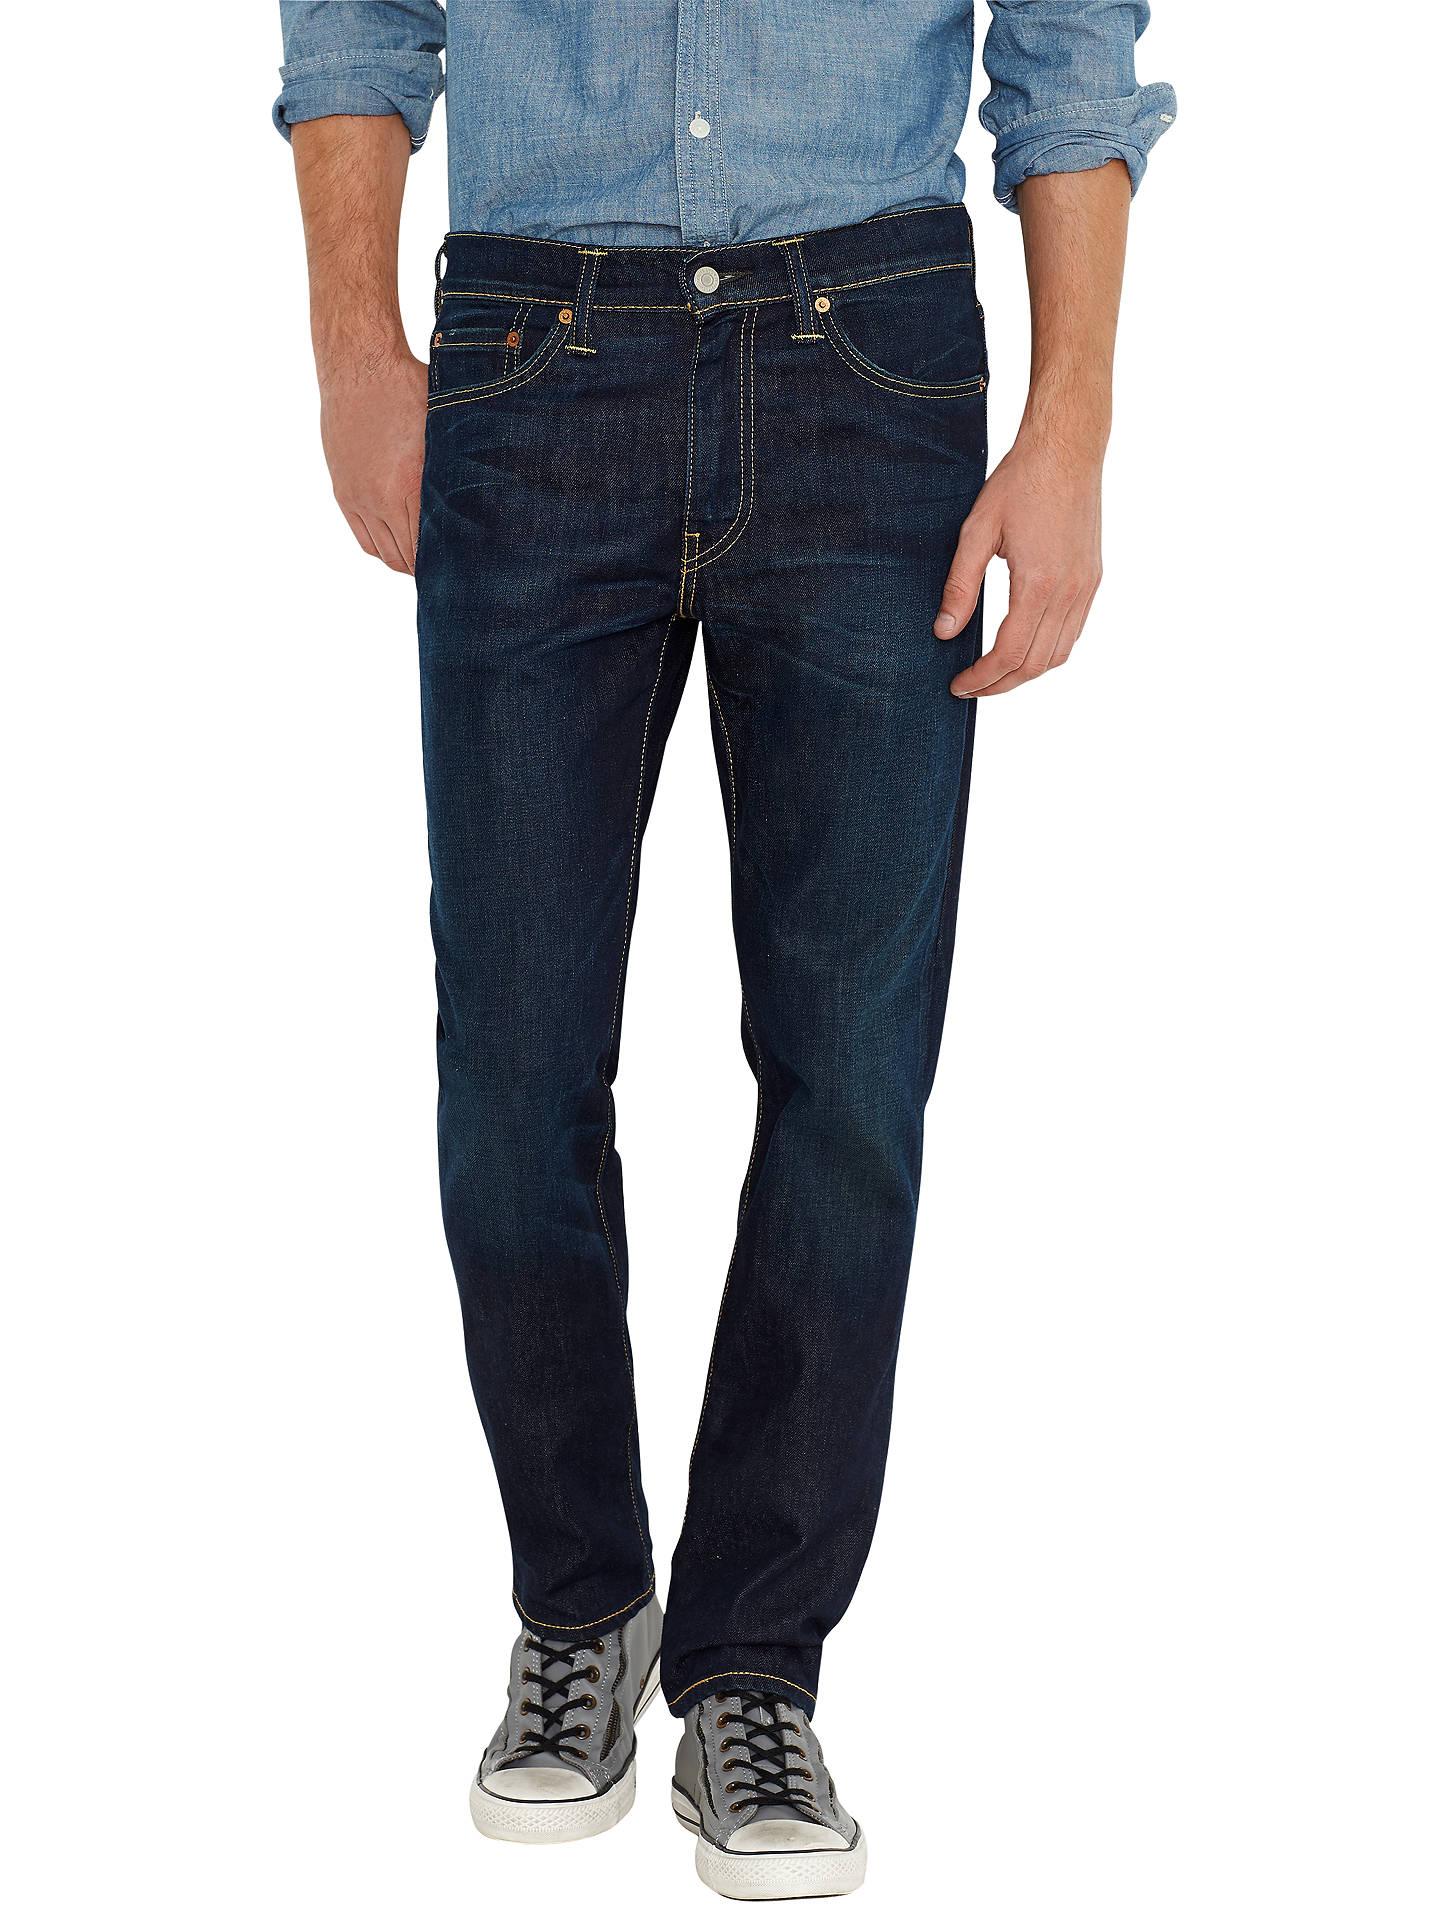 946054cc1 Buy Levi's 511 Slim Jeans, Biology, 30S Online at johnlewis. ...